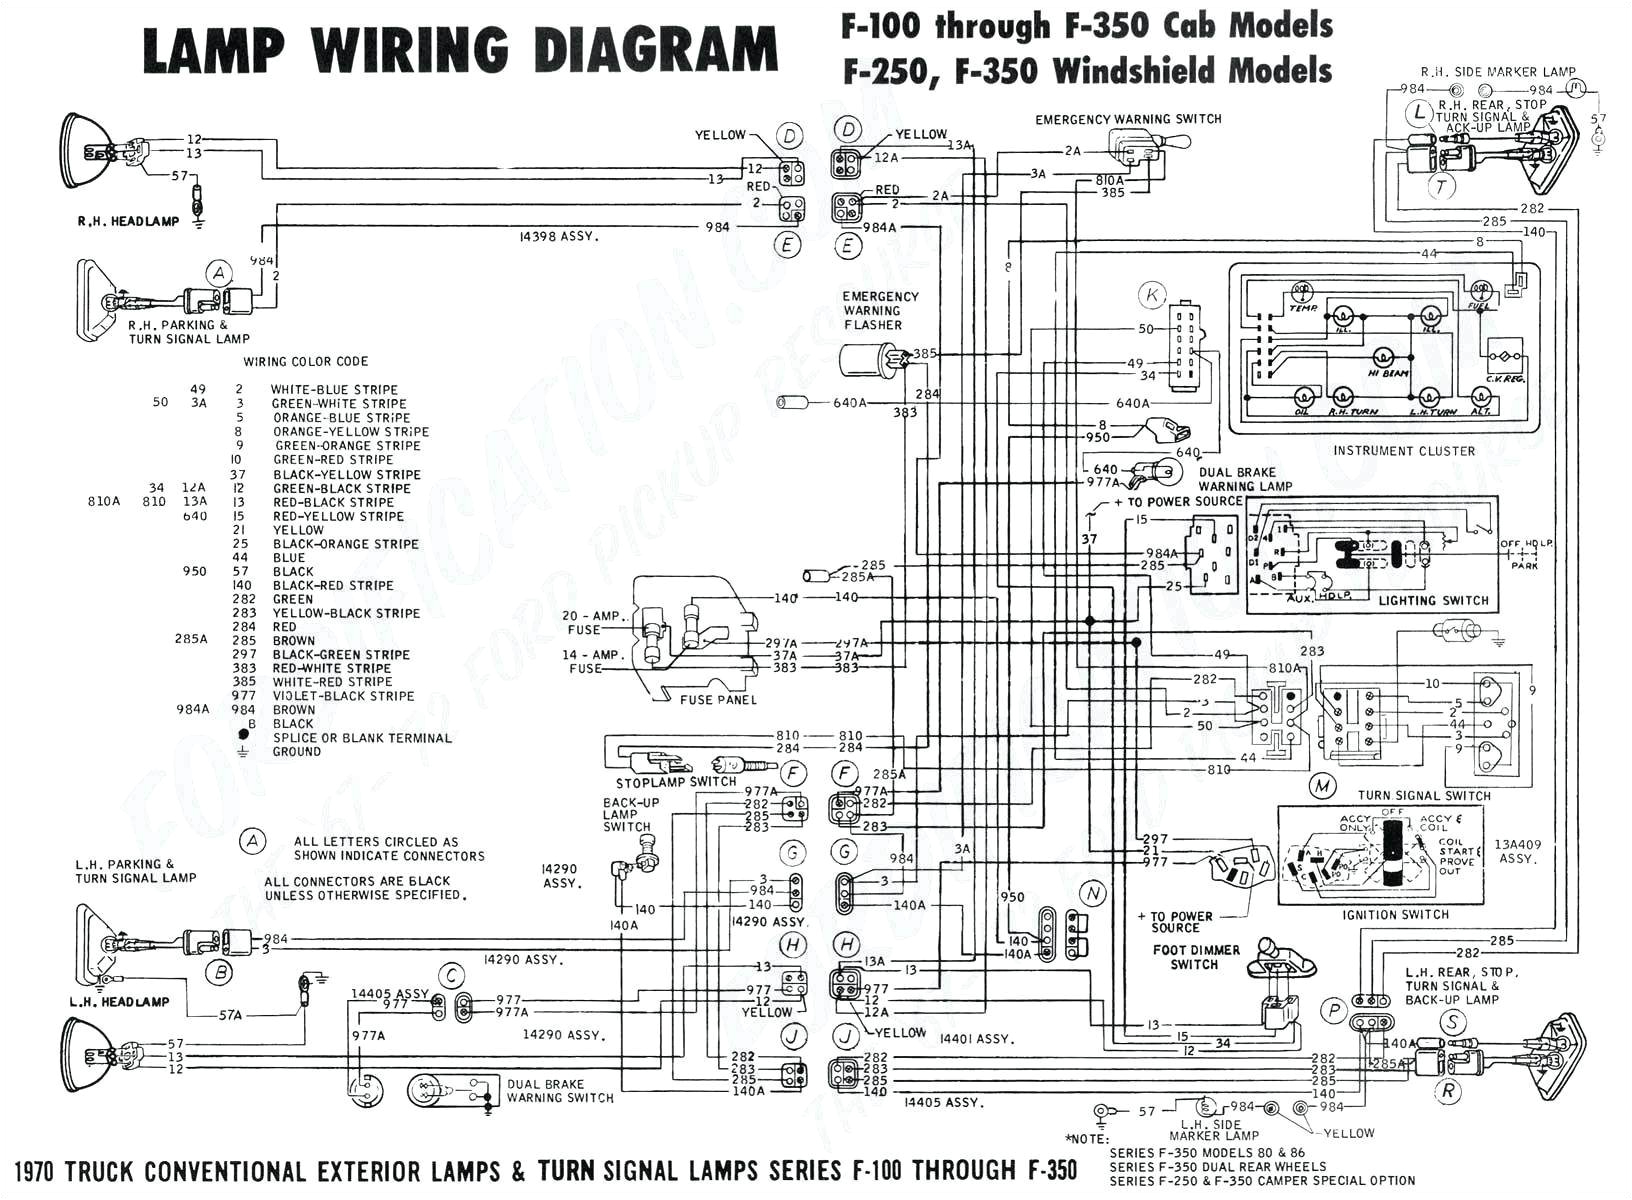 1994 dodge ram fuse box wiring diagram database fuse box diagram in addition mack truck fuse panel diagram wiring